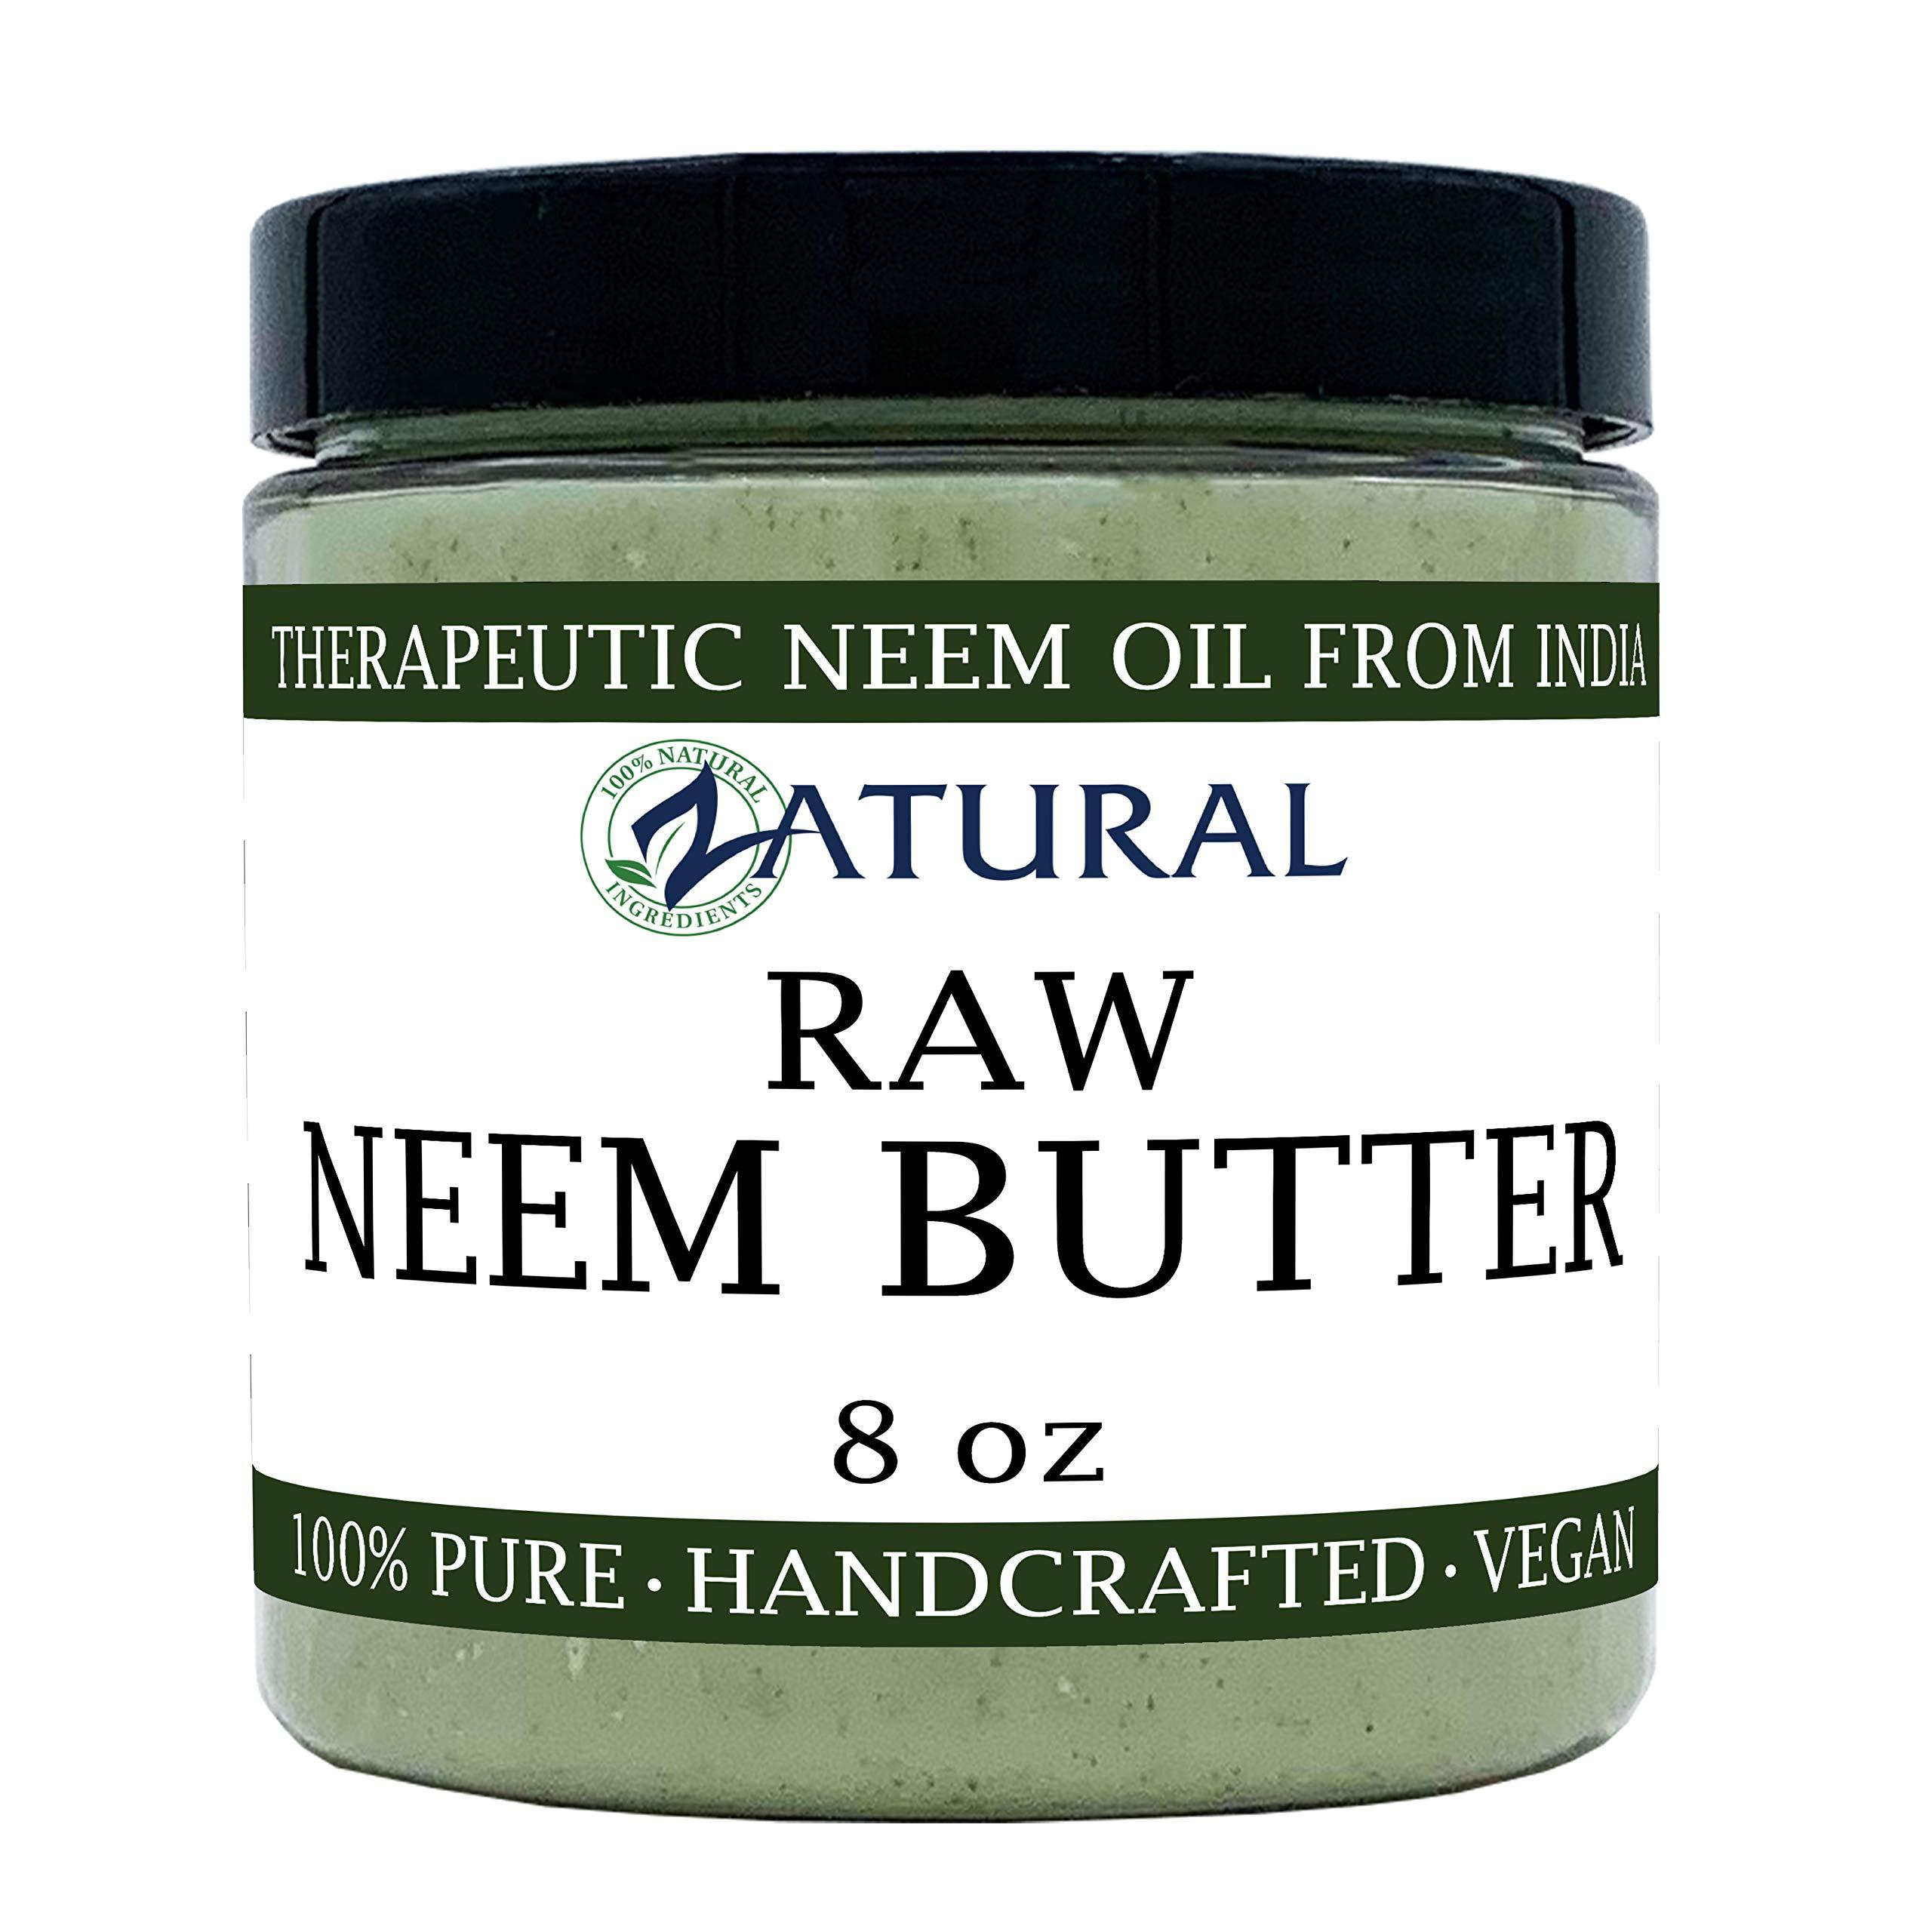 Organic Neem Butter-Shea Butter, Coconut Oil, Neem Oil, Neem Leaf, Marula Oil, Kokum Butter, Rosemary (8 Ounce) by Zatural